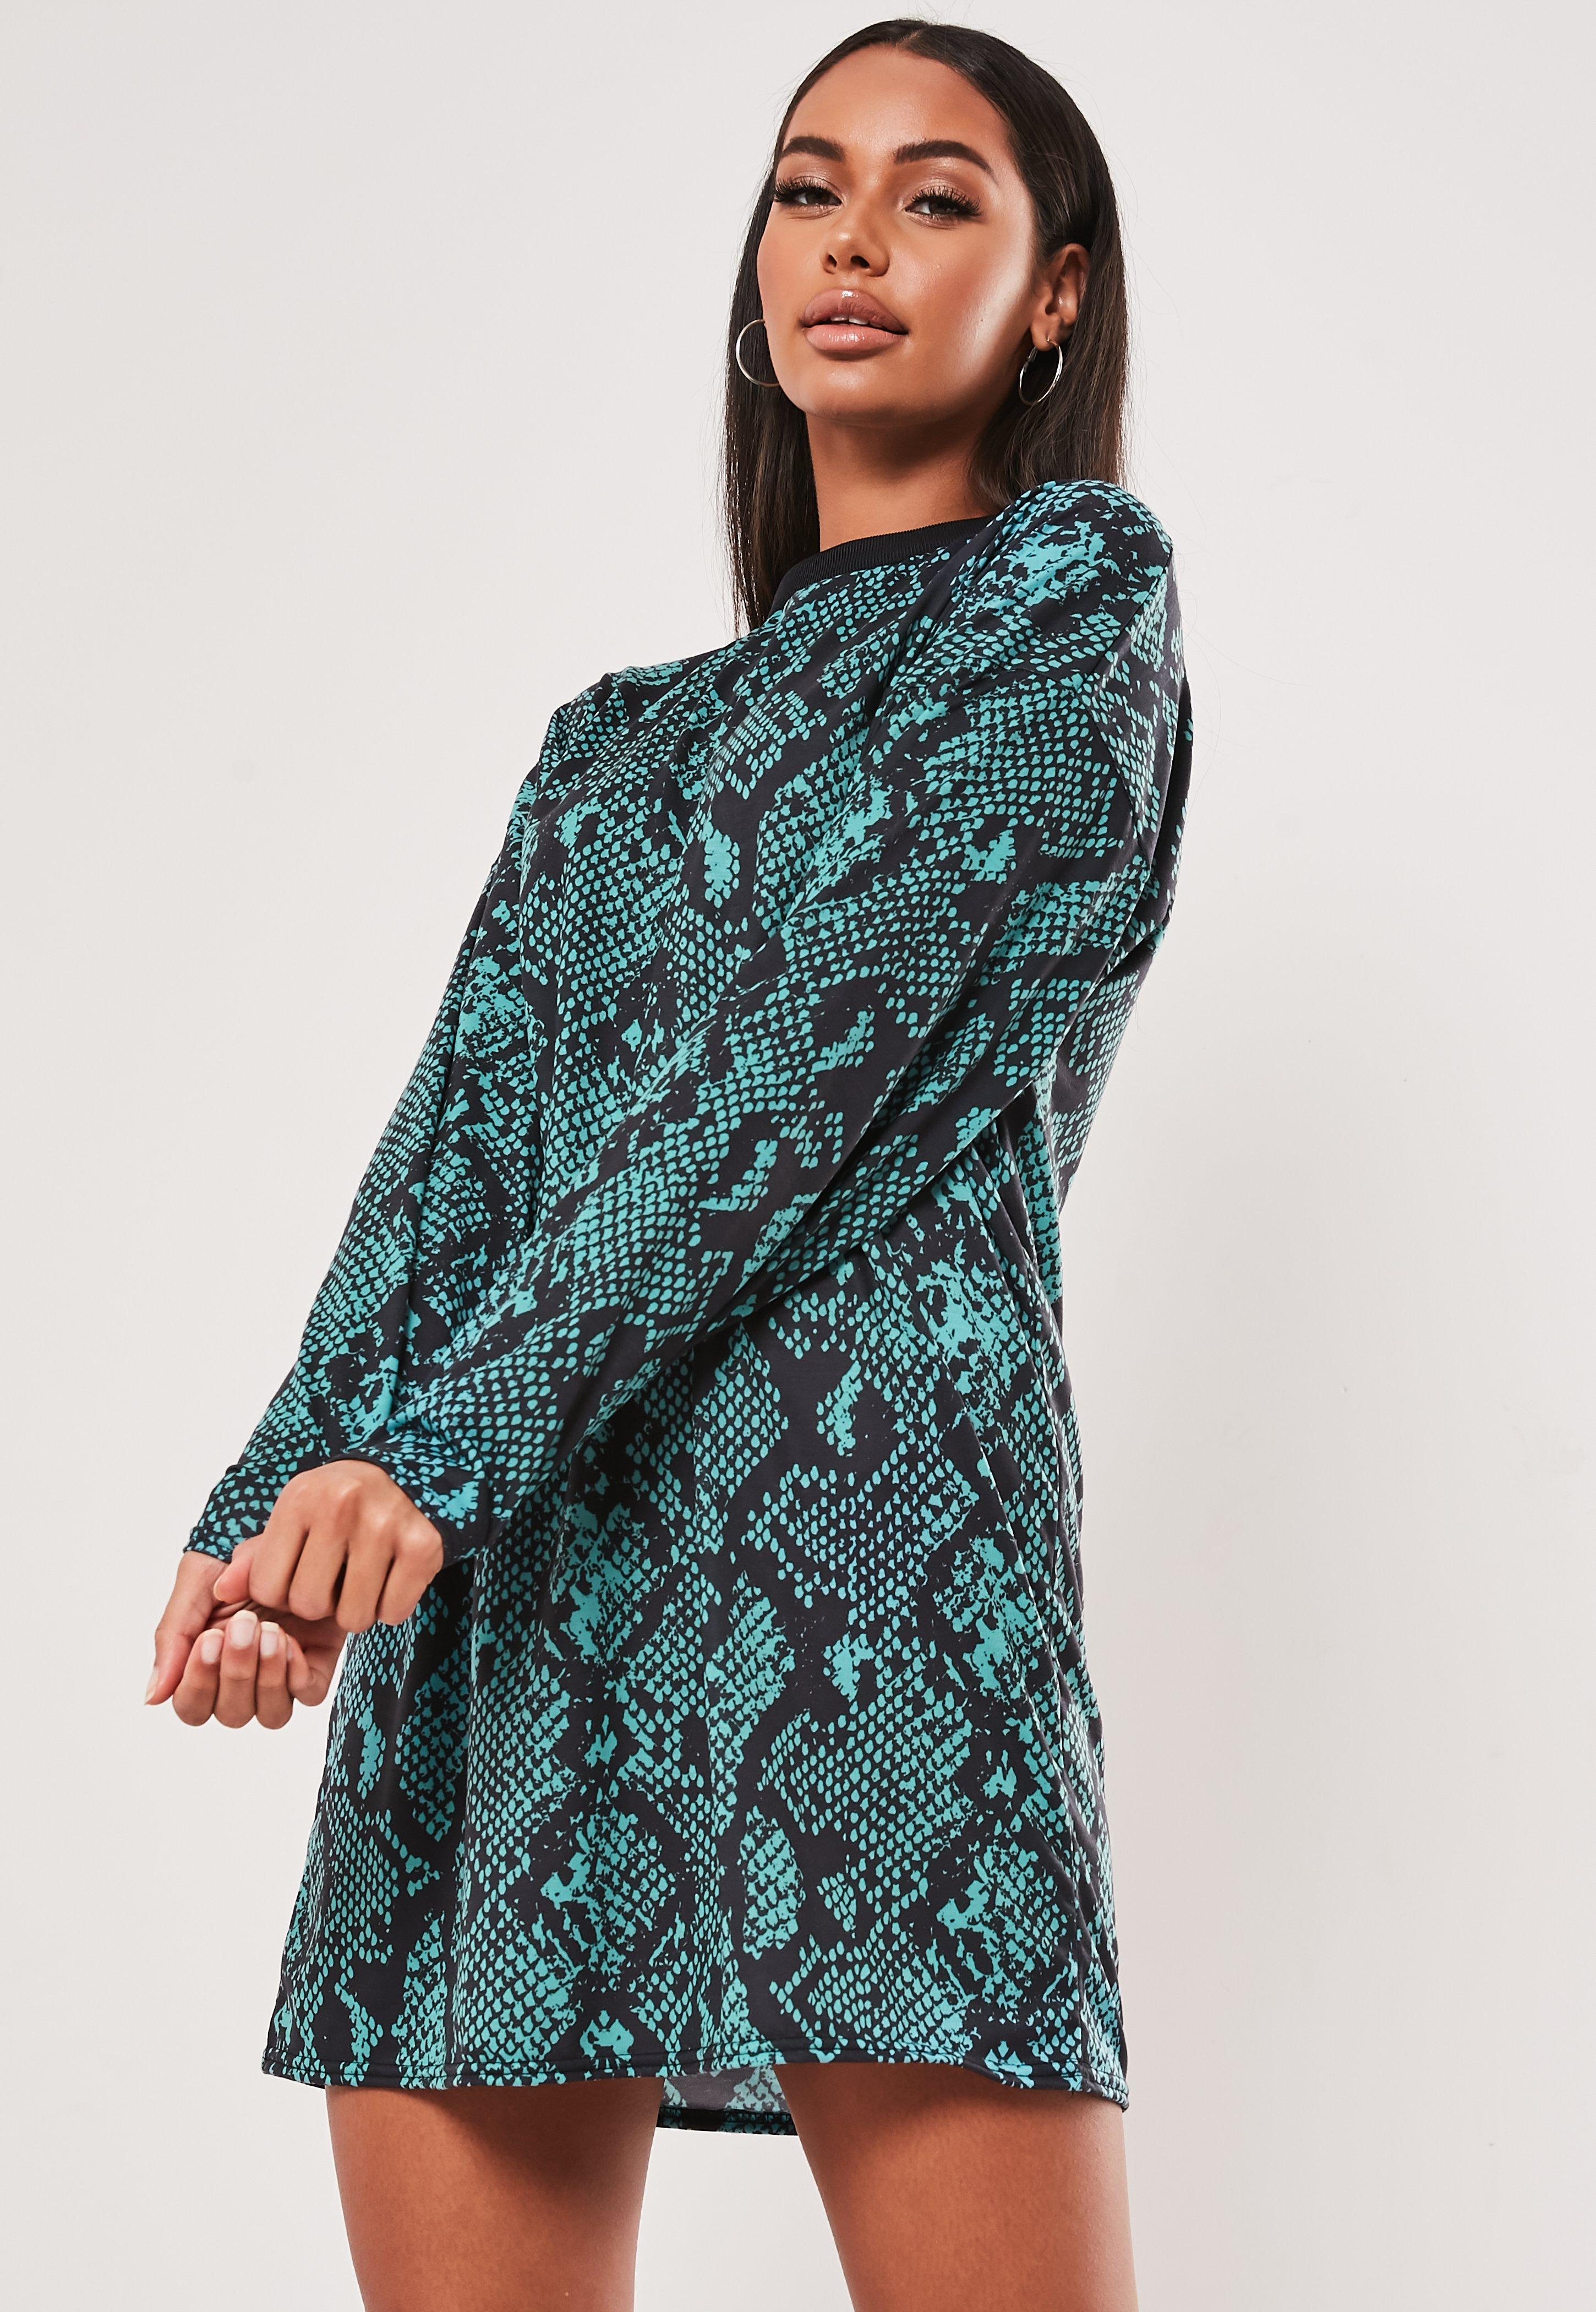 Teal Snake Print Oversized T Shirt Dress